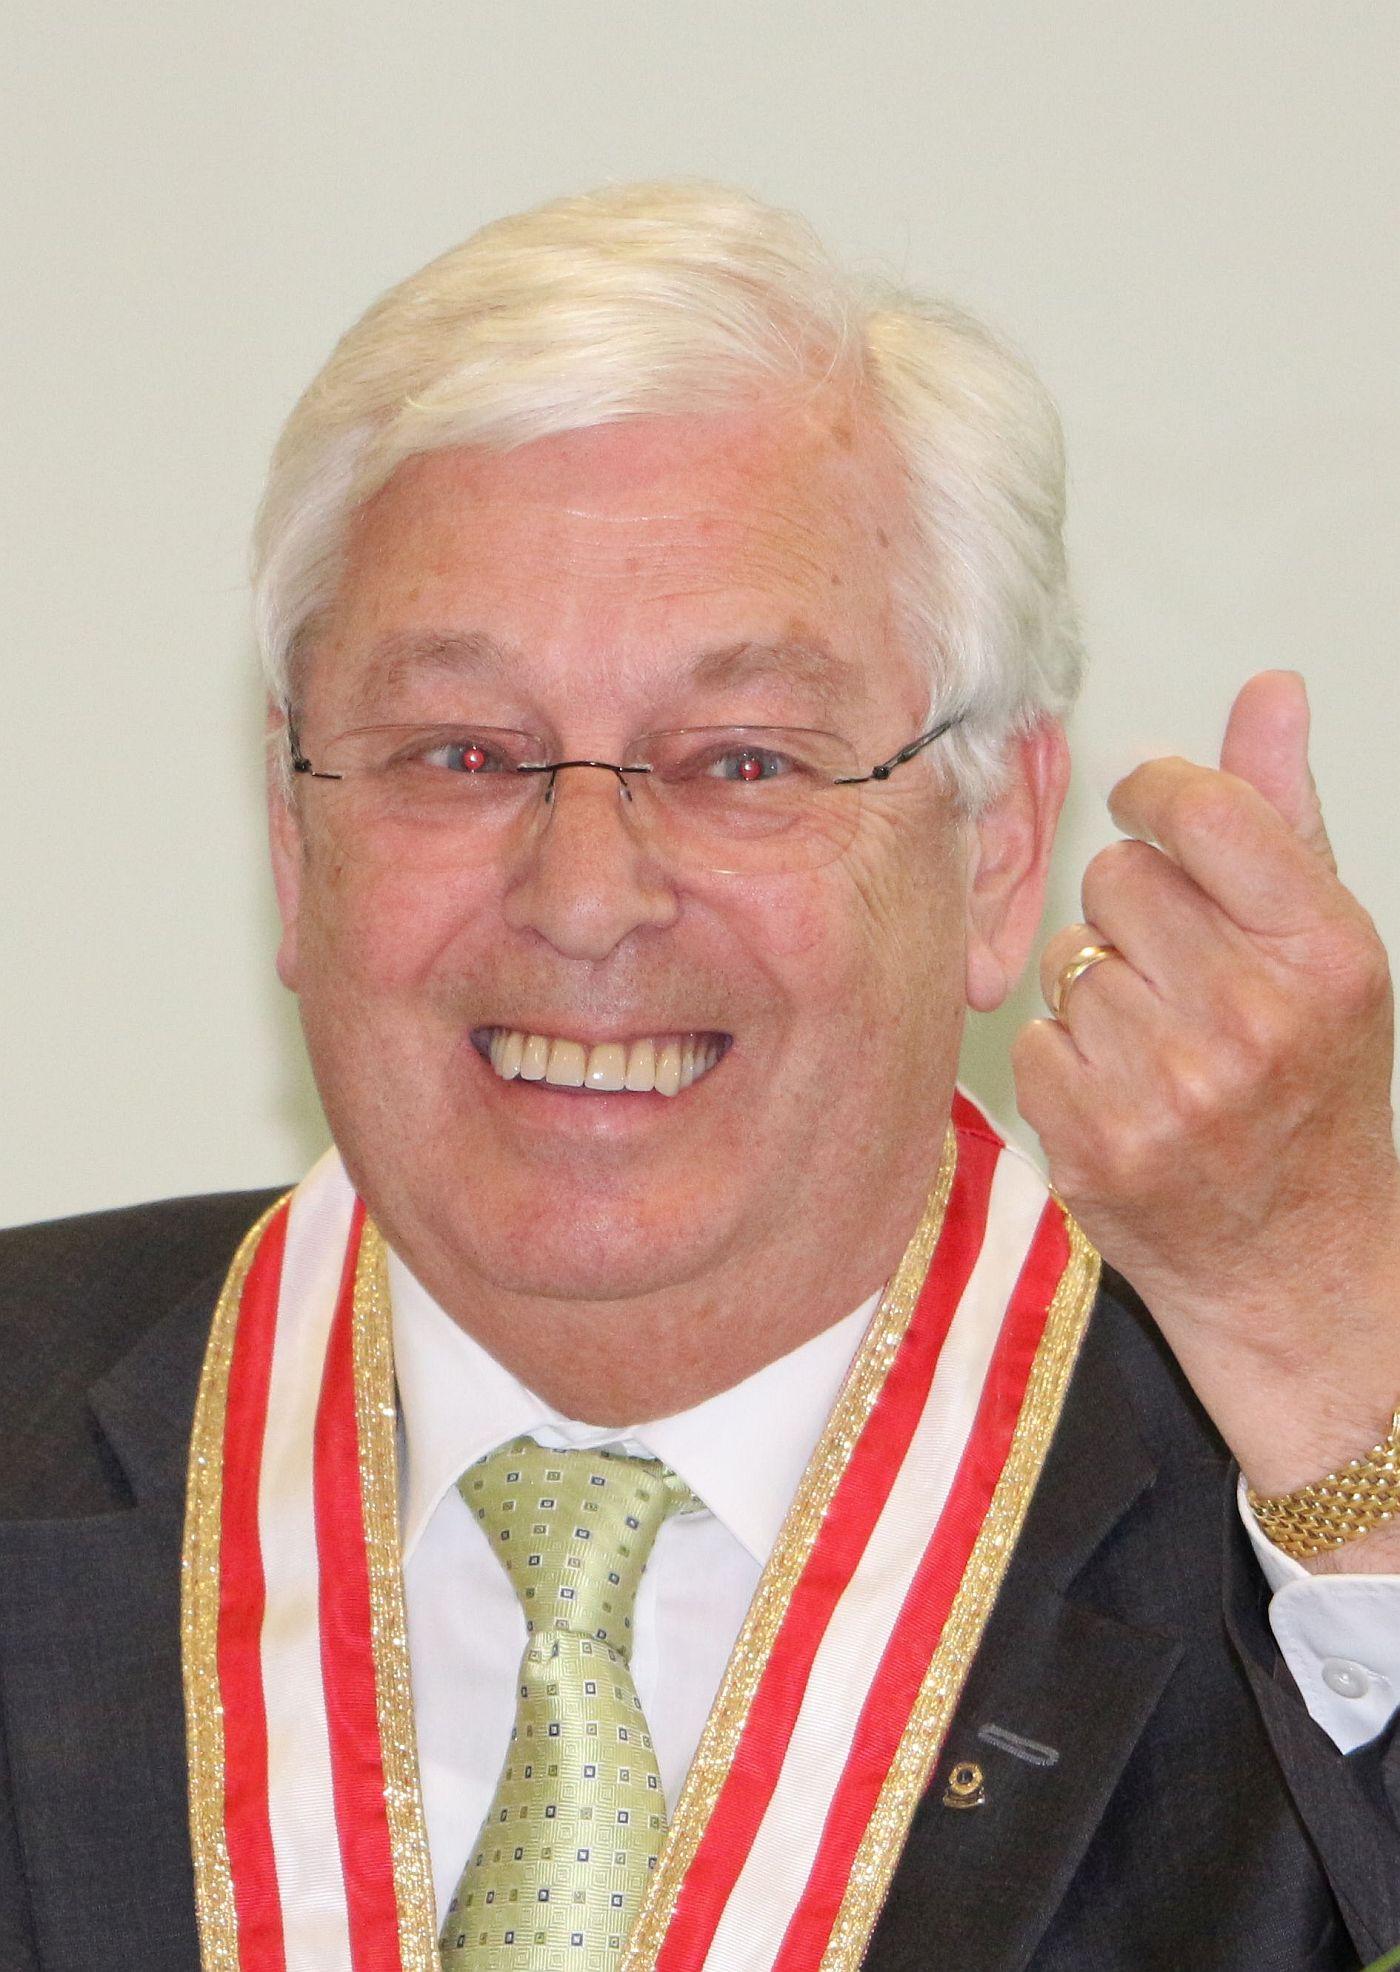 KR Horst WENDE